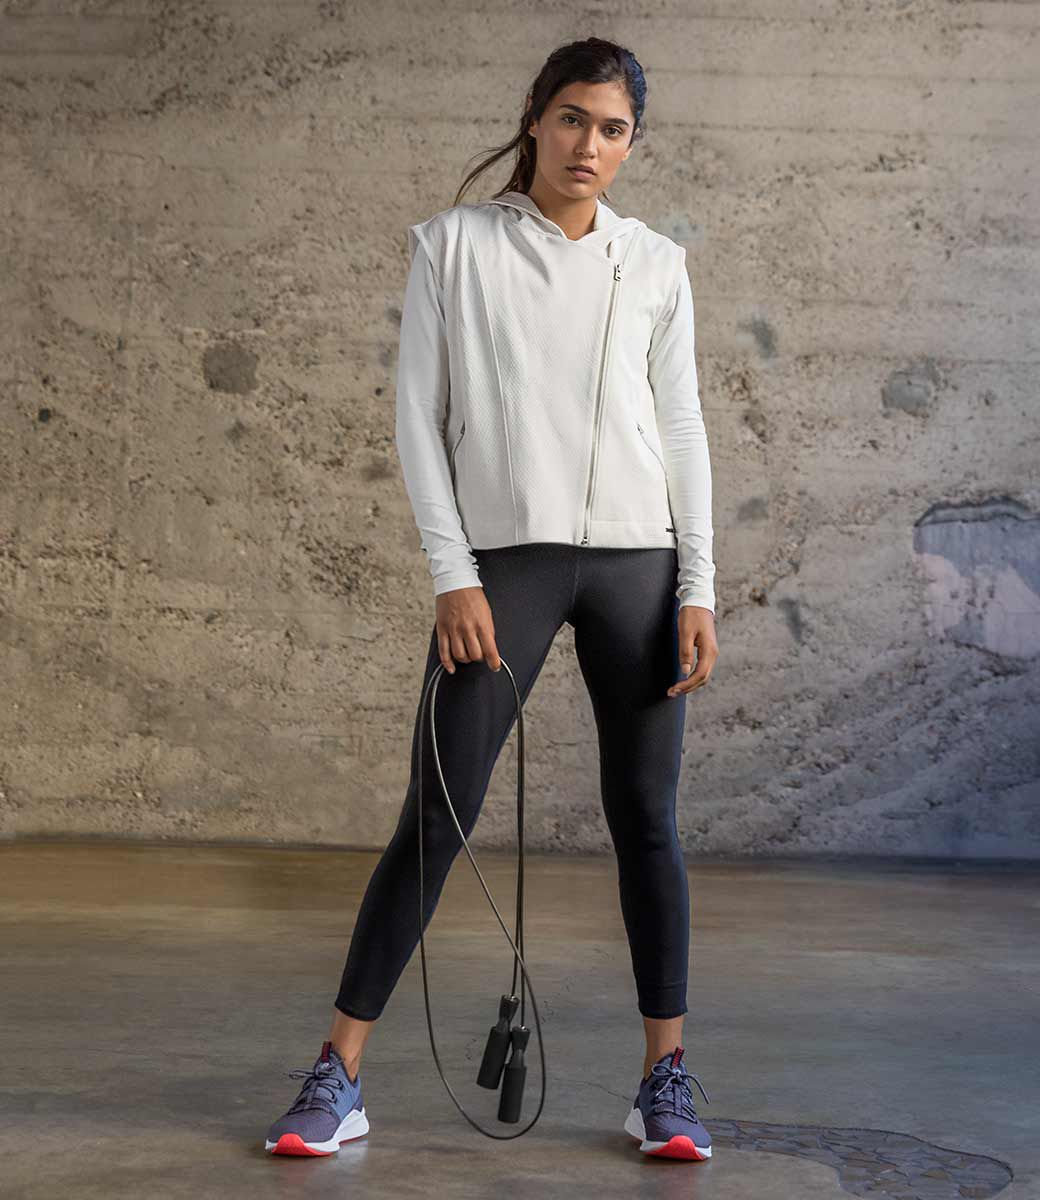 New Balance US Womens Lazr Hyposkin,